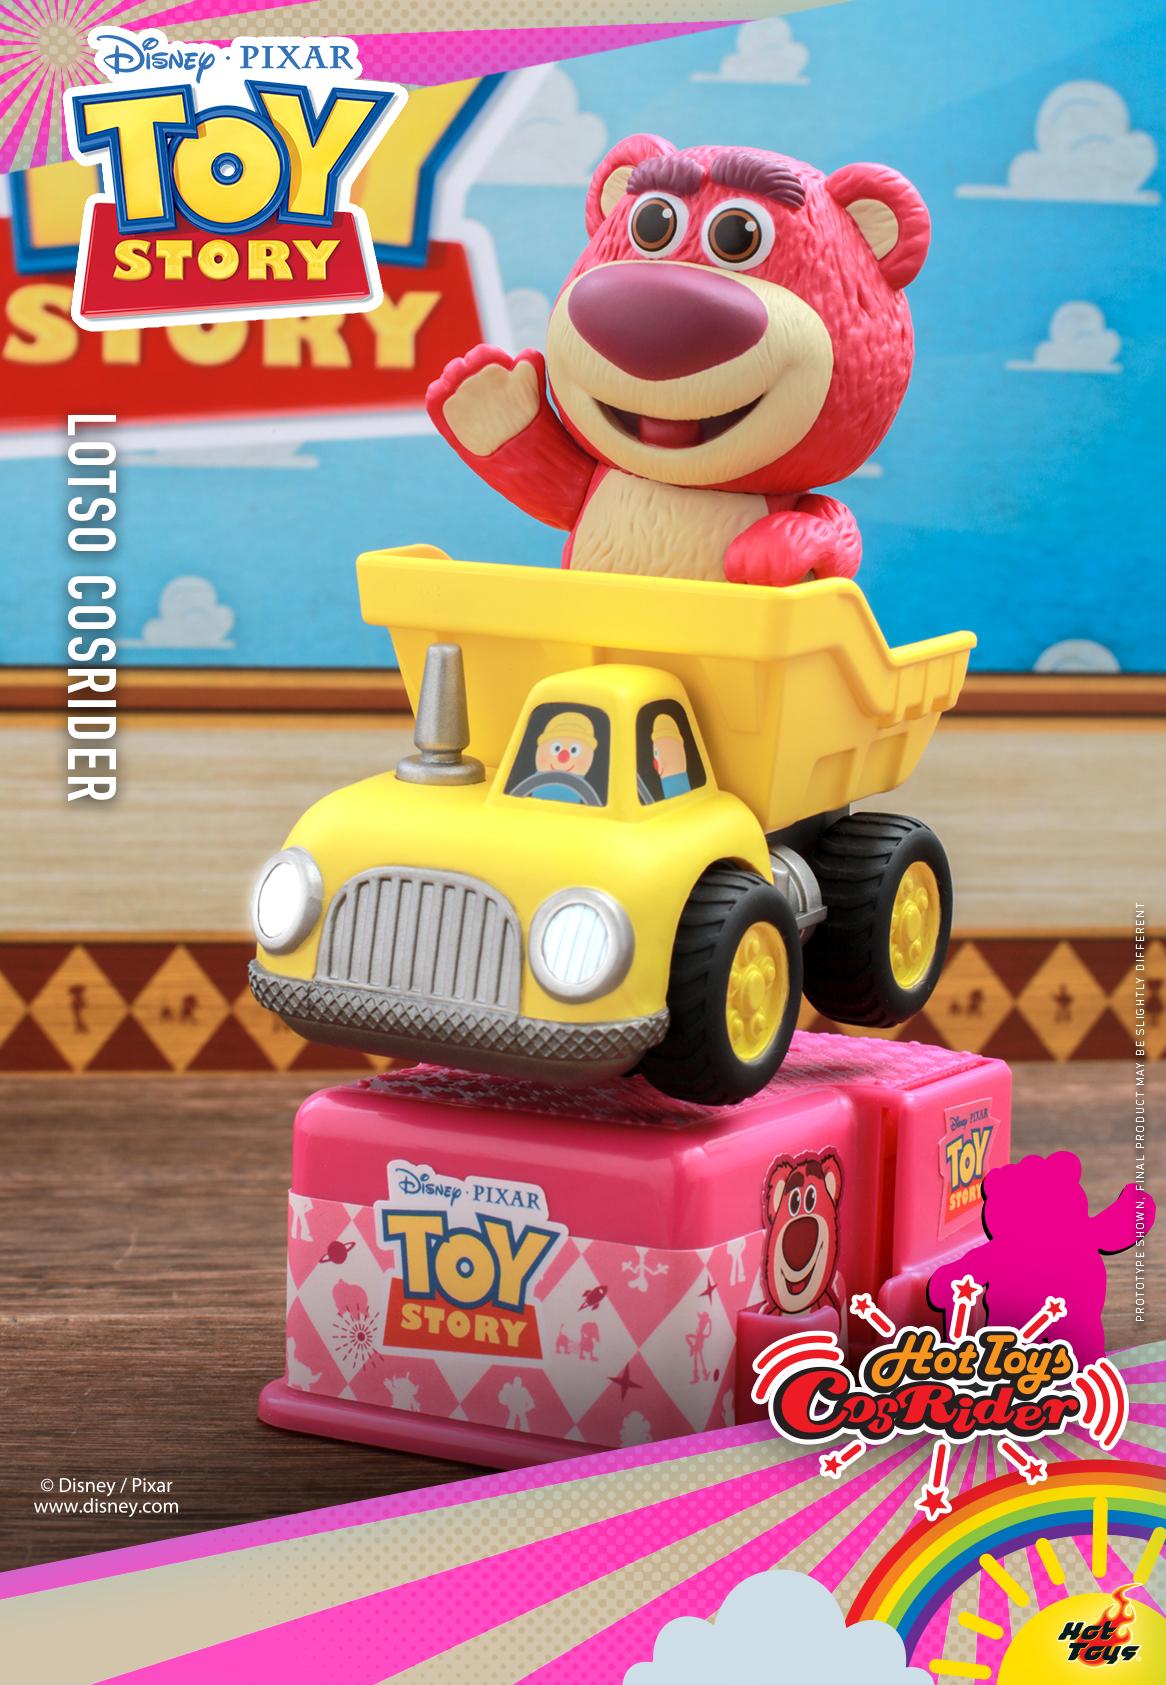 Hot Toys - Toy Story - Lotso CosRider_PR1